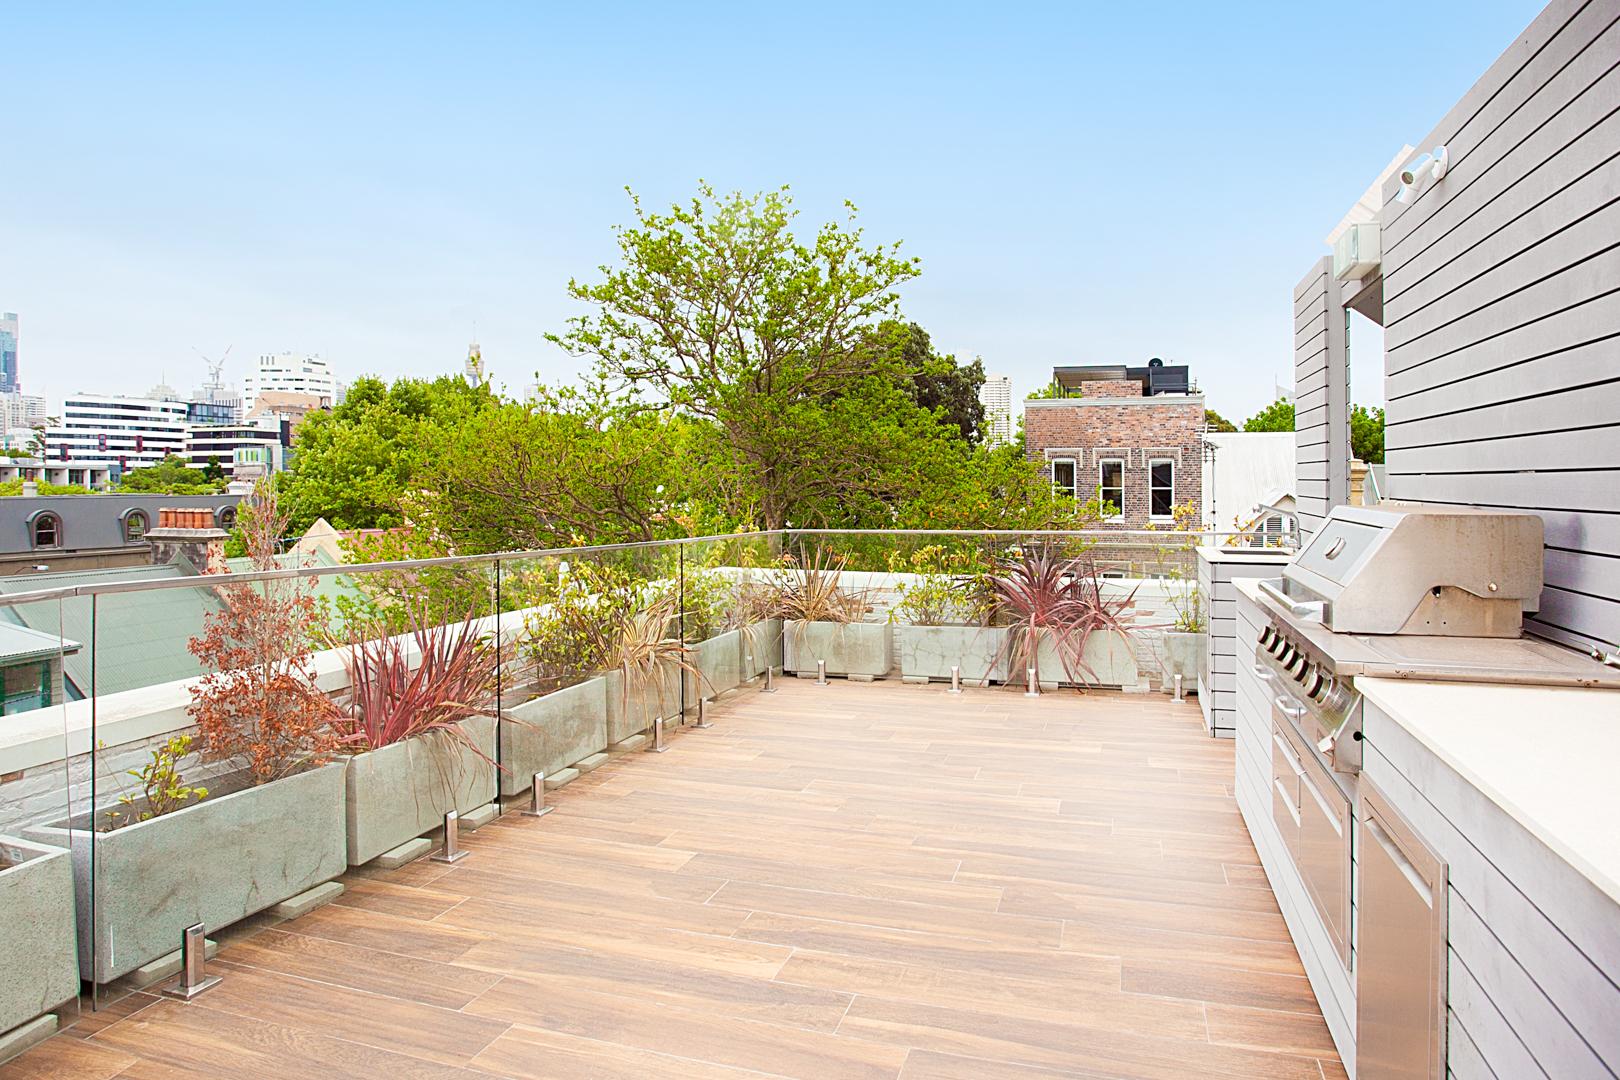 Terrace at The Seymour Apartments, Paddington, Sydney